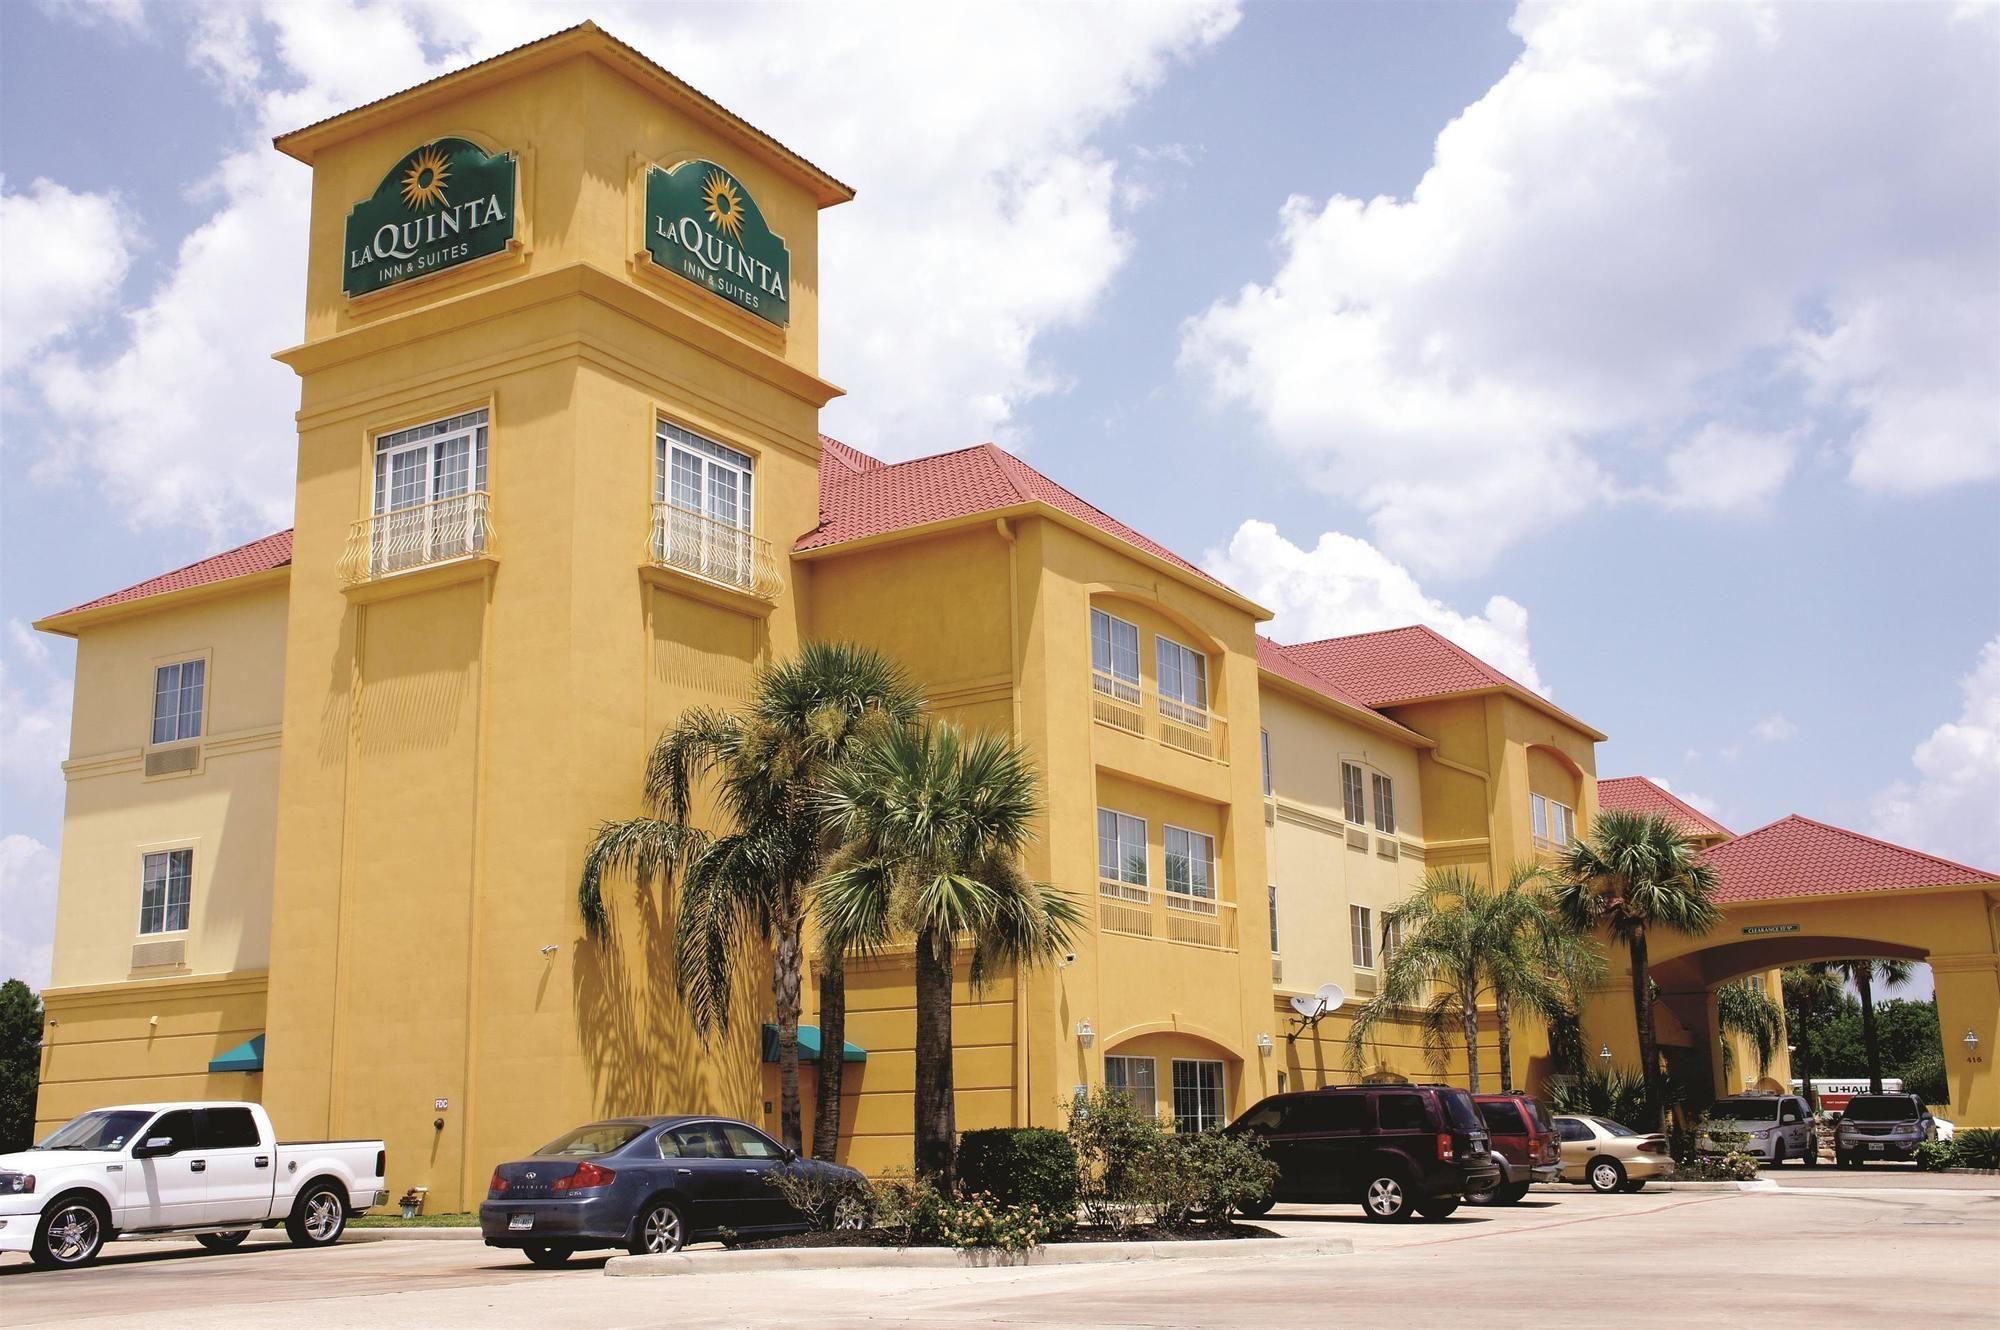 La Quinta Inn & Suites Houston 1960 in Houston, TX